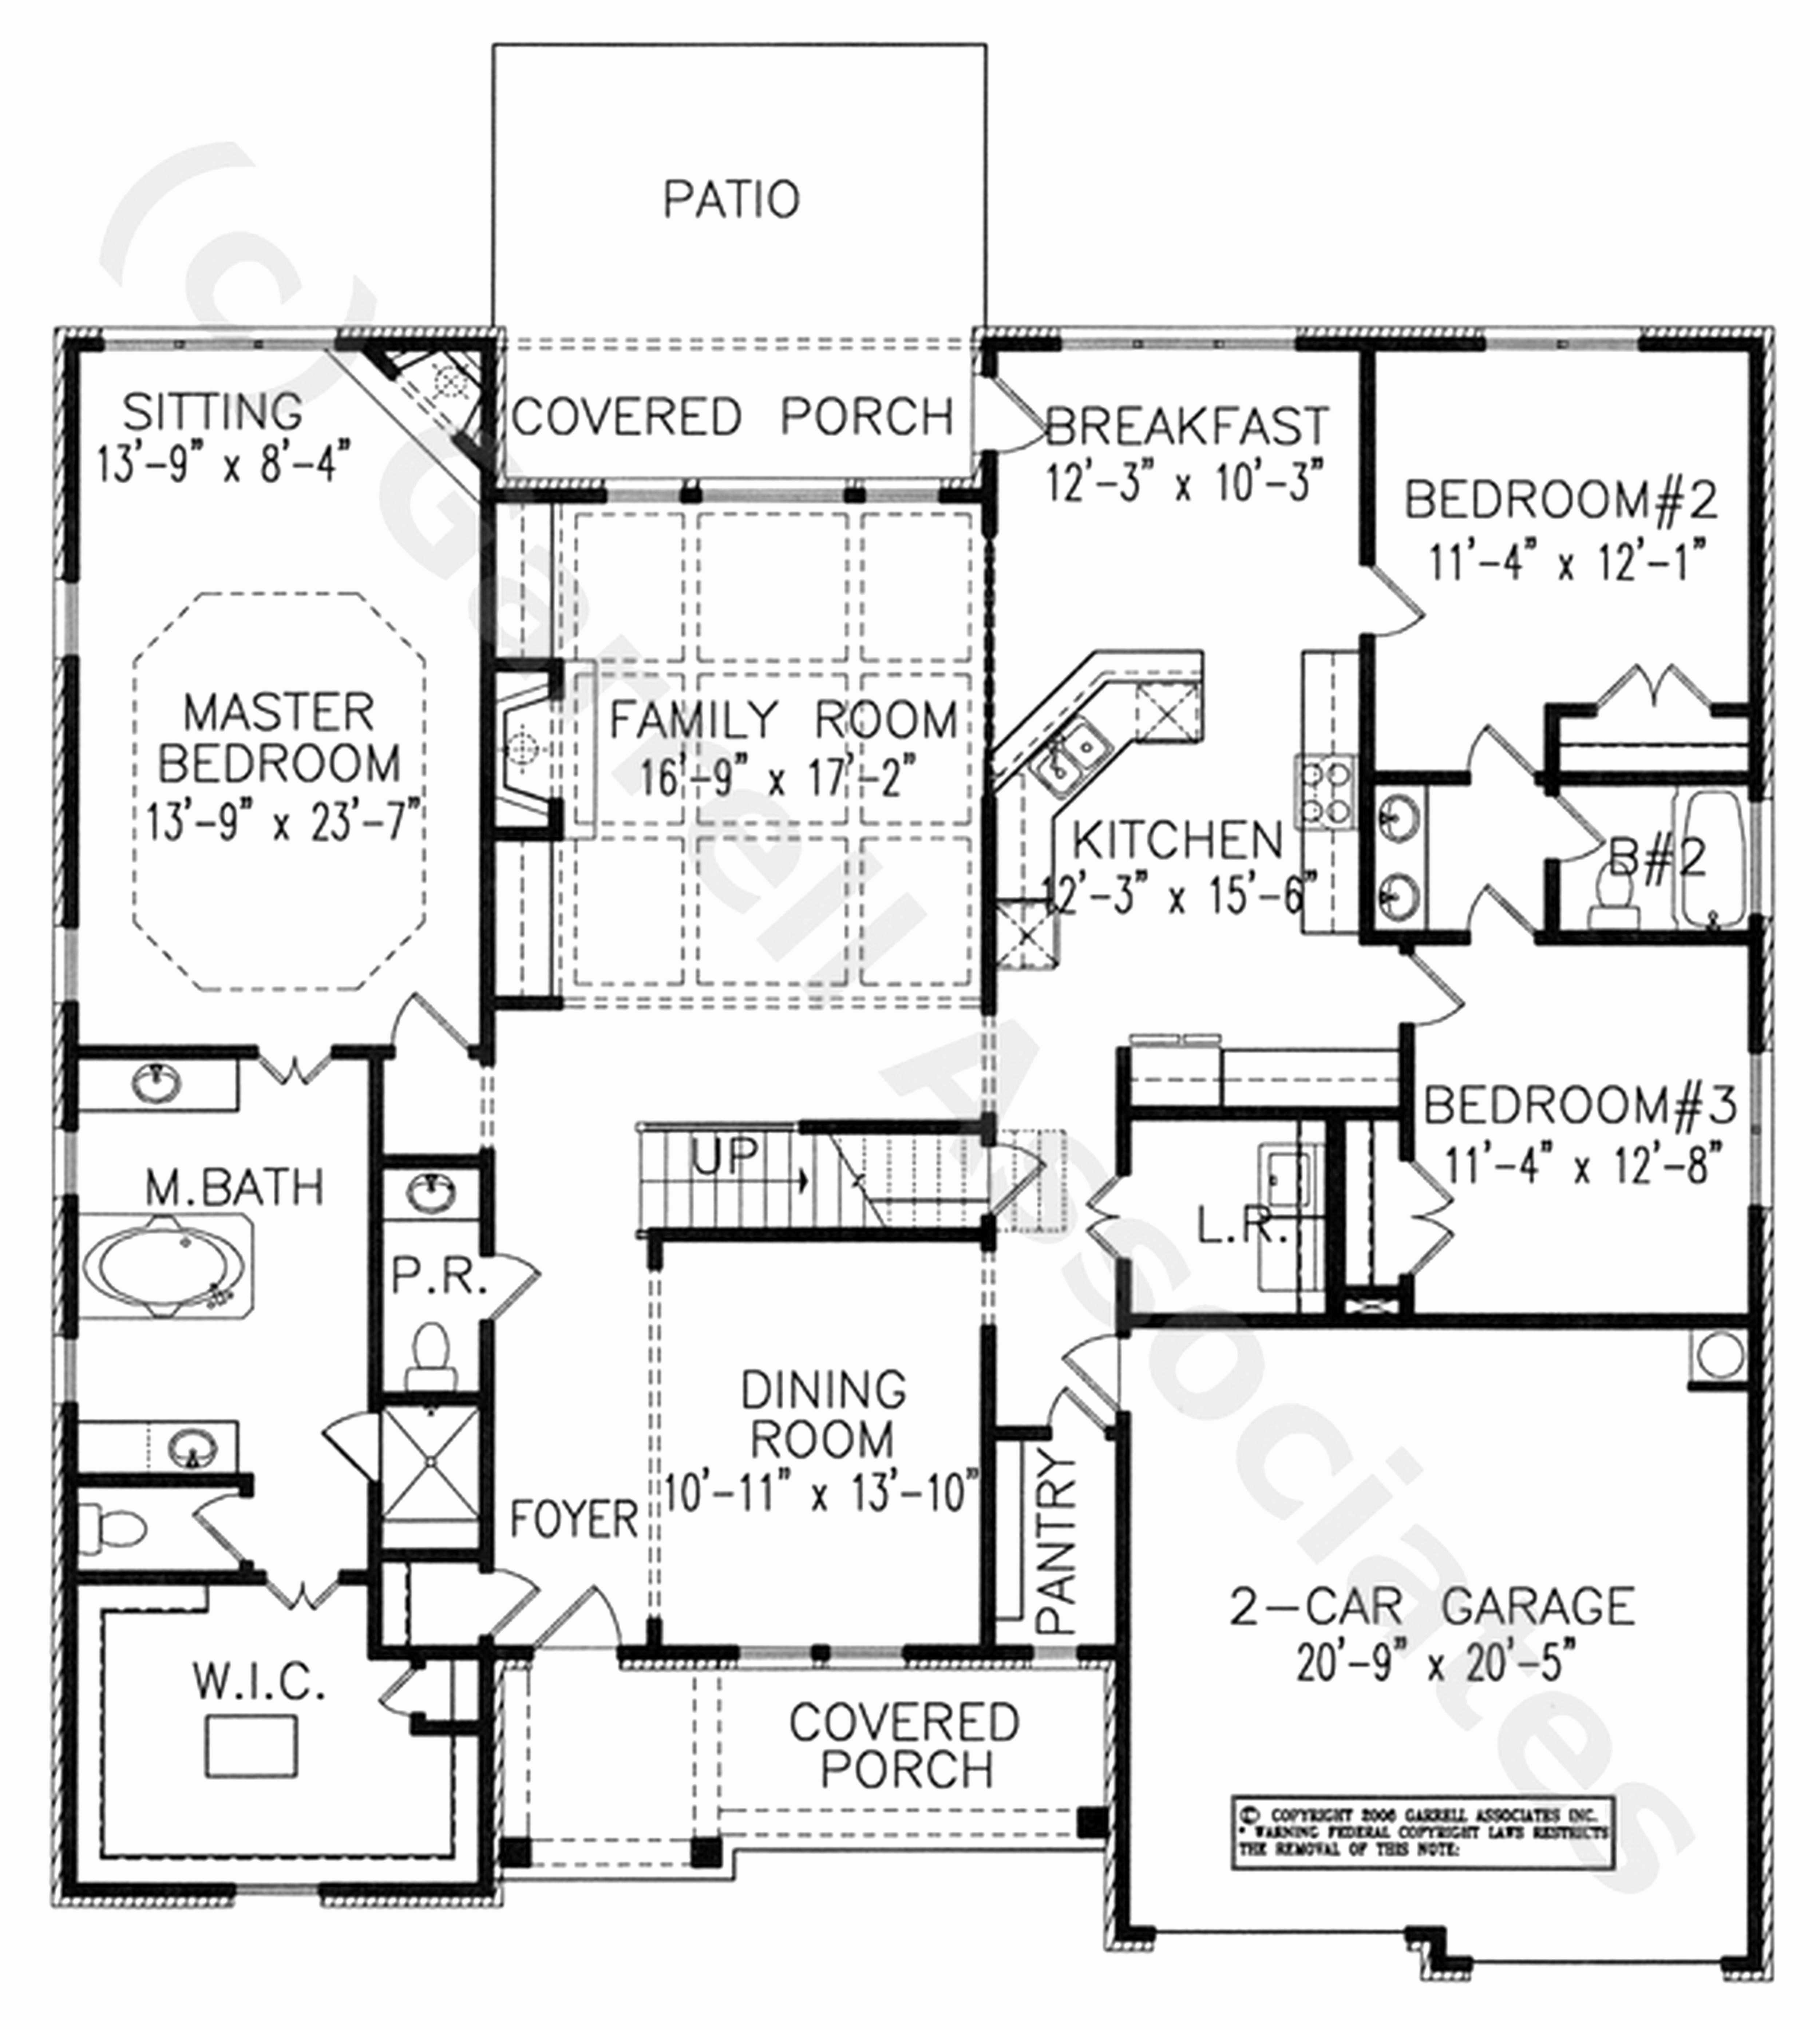 English Farmhouse Floor Plans Elegant English Farmhouse Floor Plans 15 Fresh Old Ranch Style House Plans Cafe Floor Plan Minecraft Modern House Blueprints